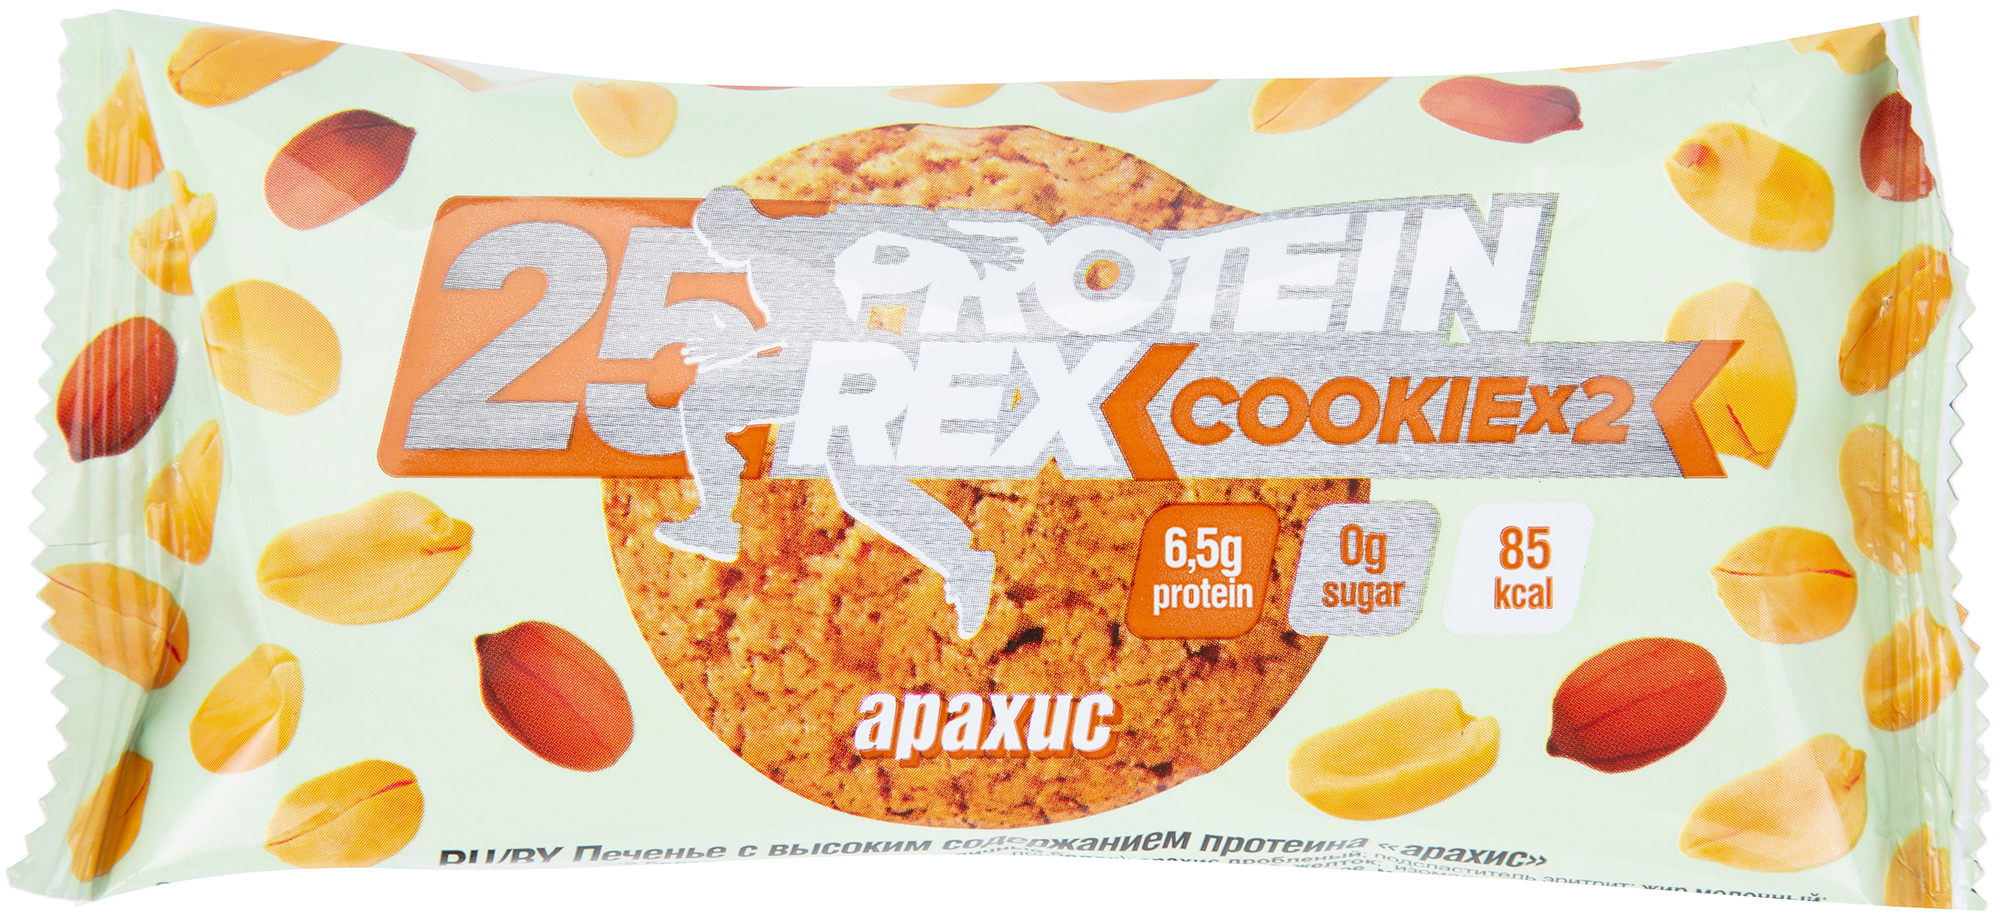 ProteinREX Печенье арахис